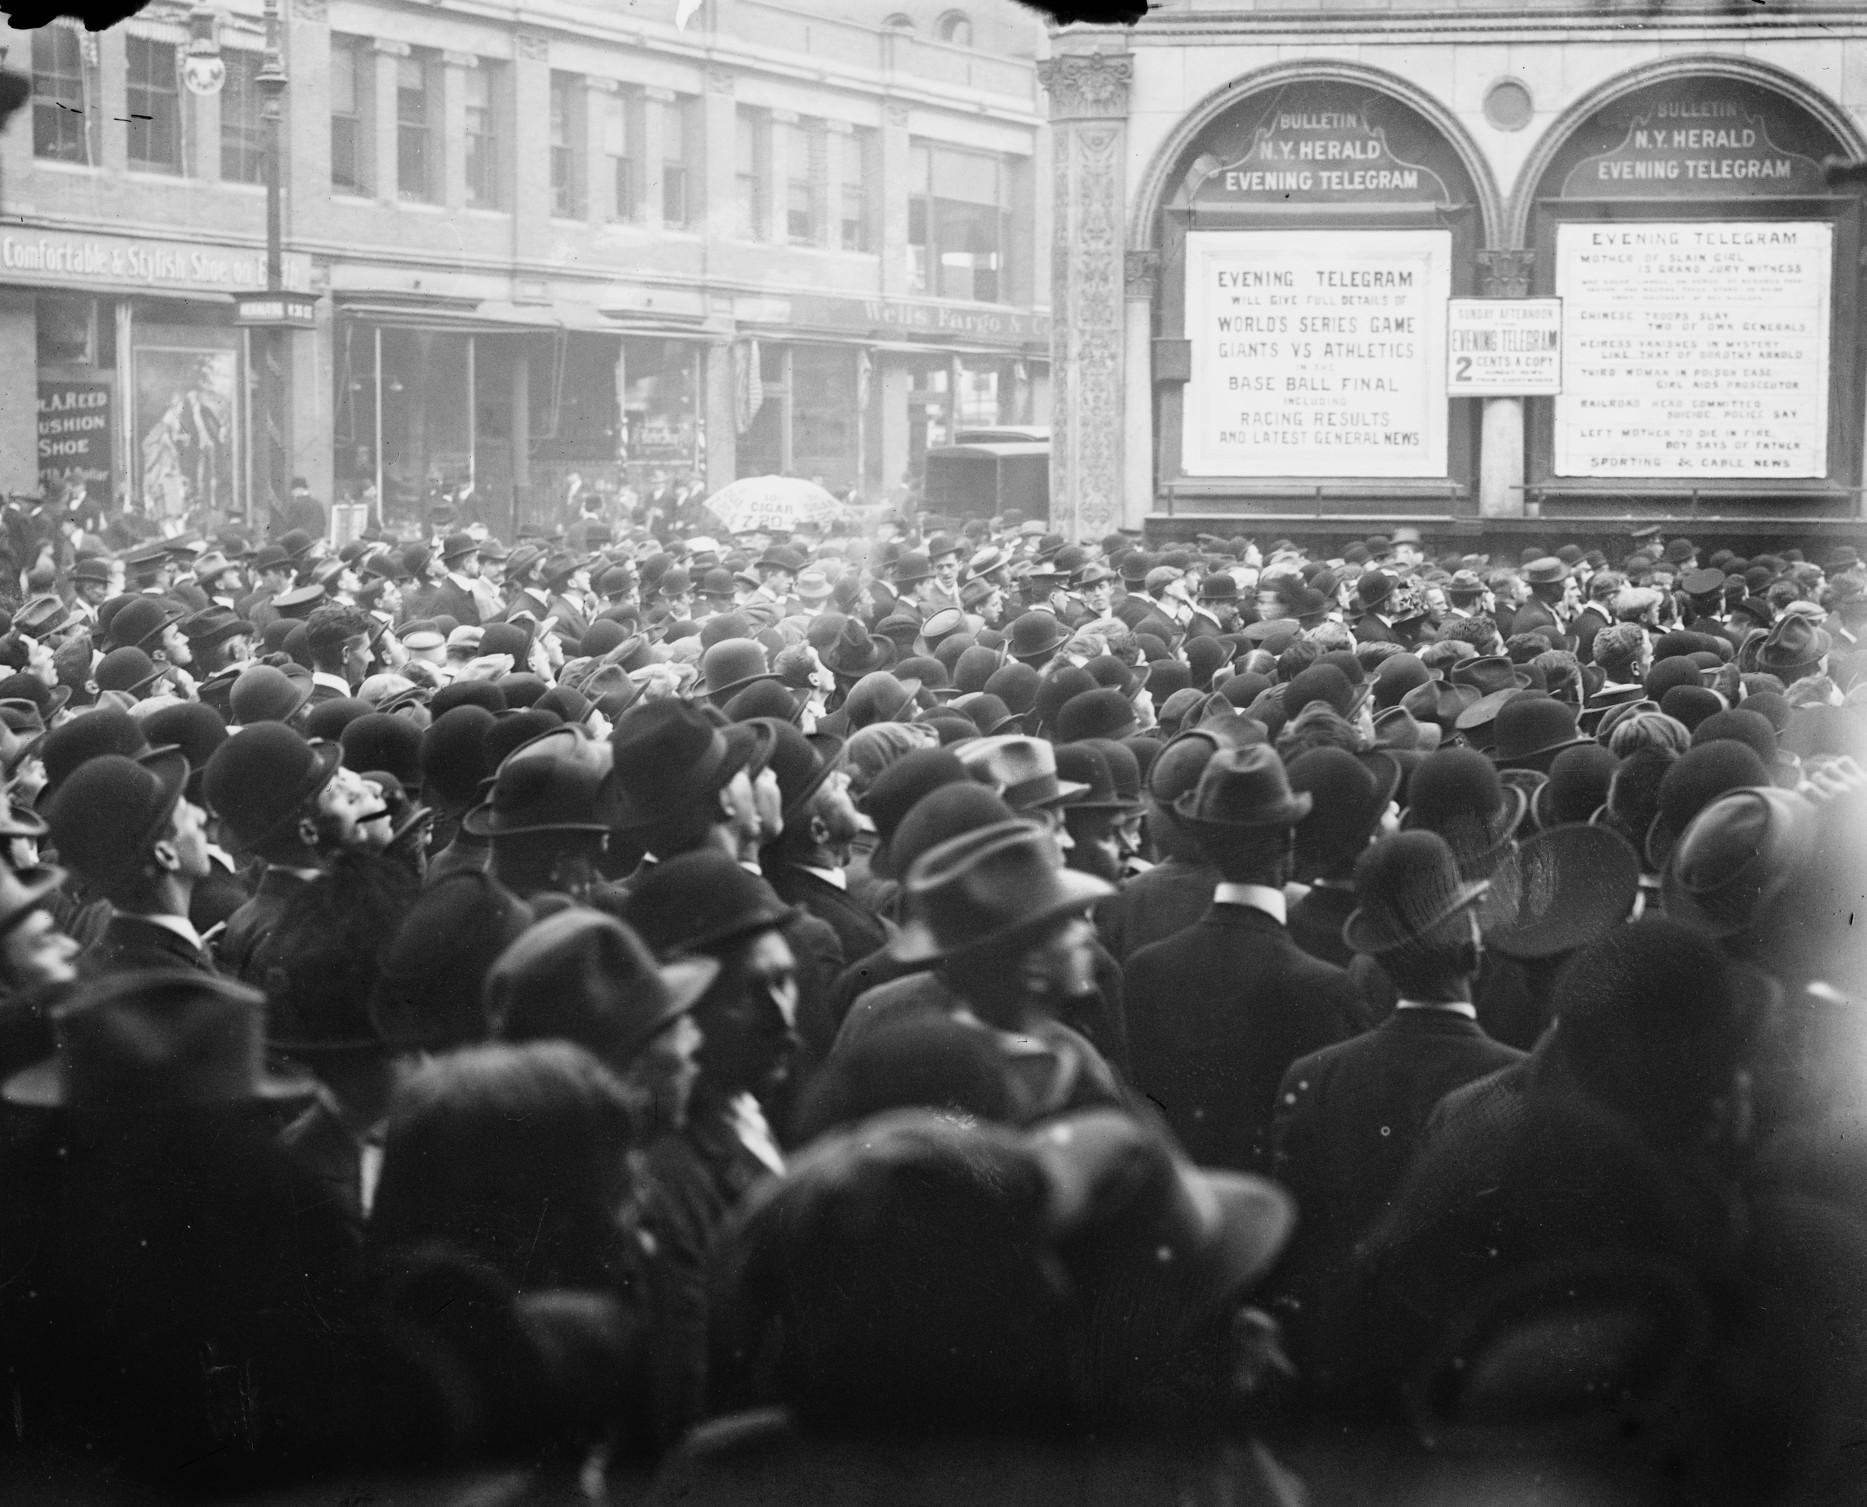 1911-World-Series-Game-6-outside-New-York-Herald-Building.jpg